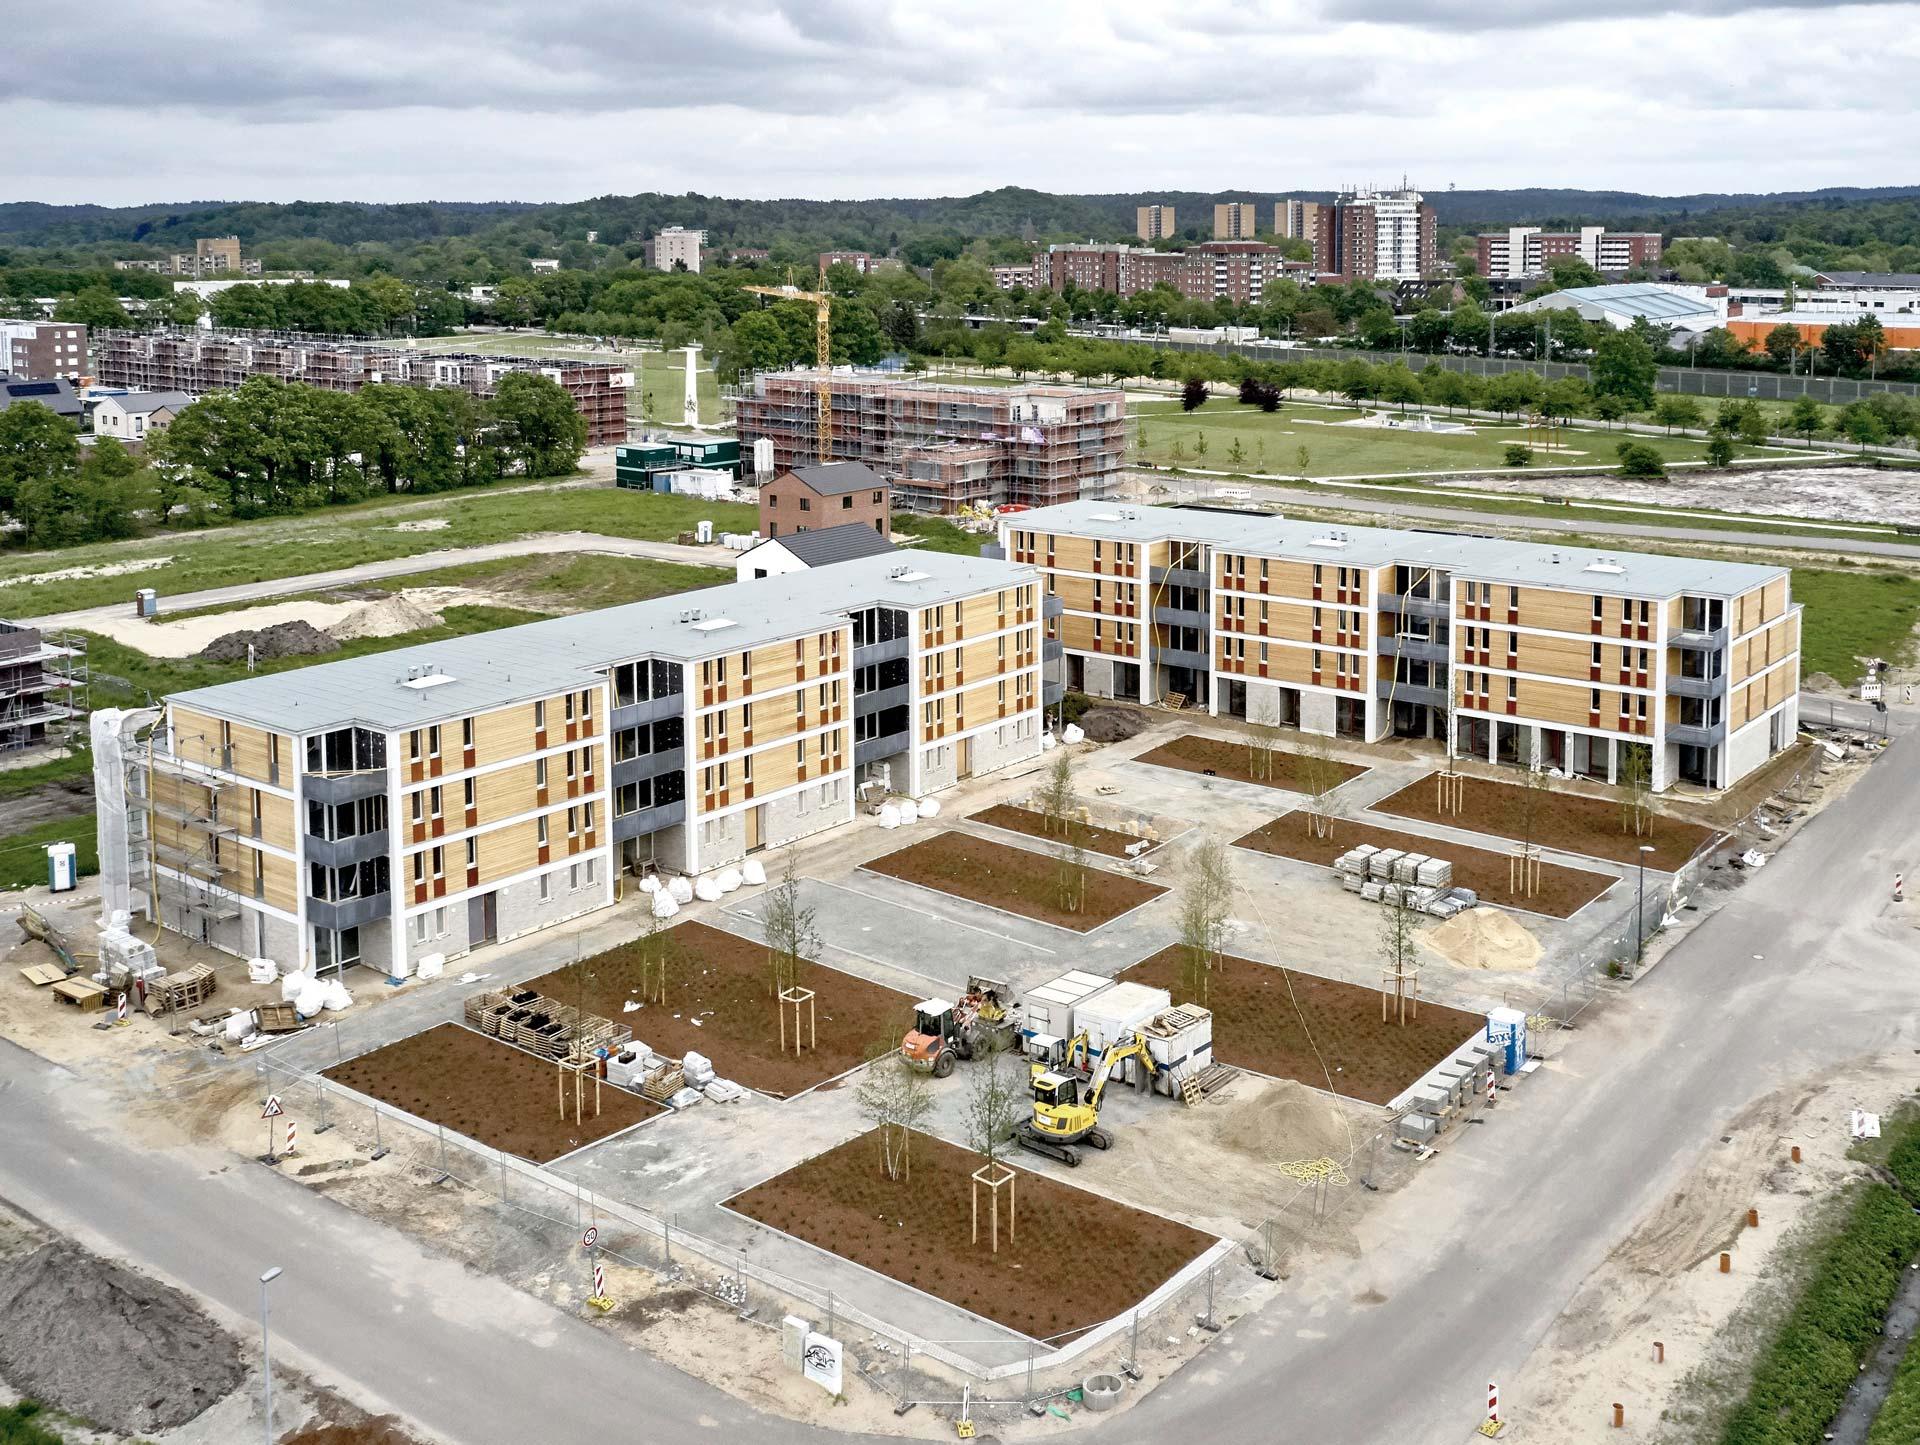 Vogelkamp - Limbrock Tubbesing Architekten Neugraben Fischbek